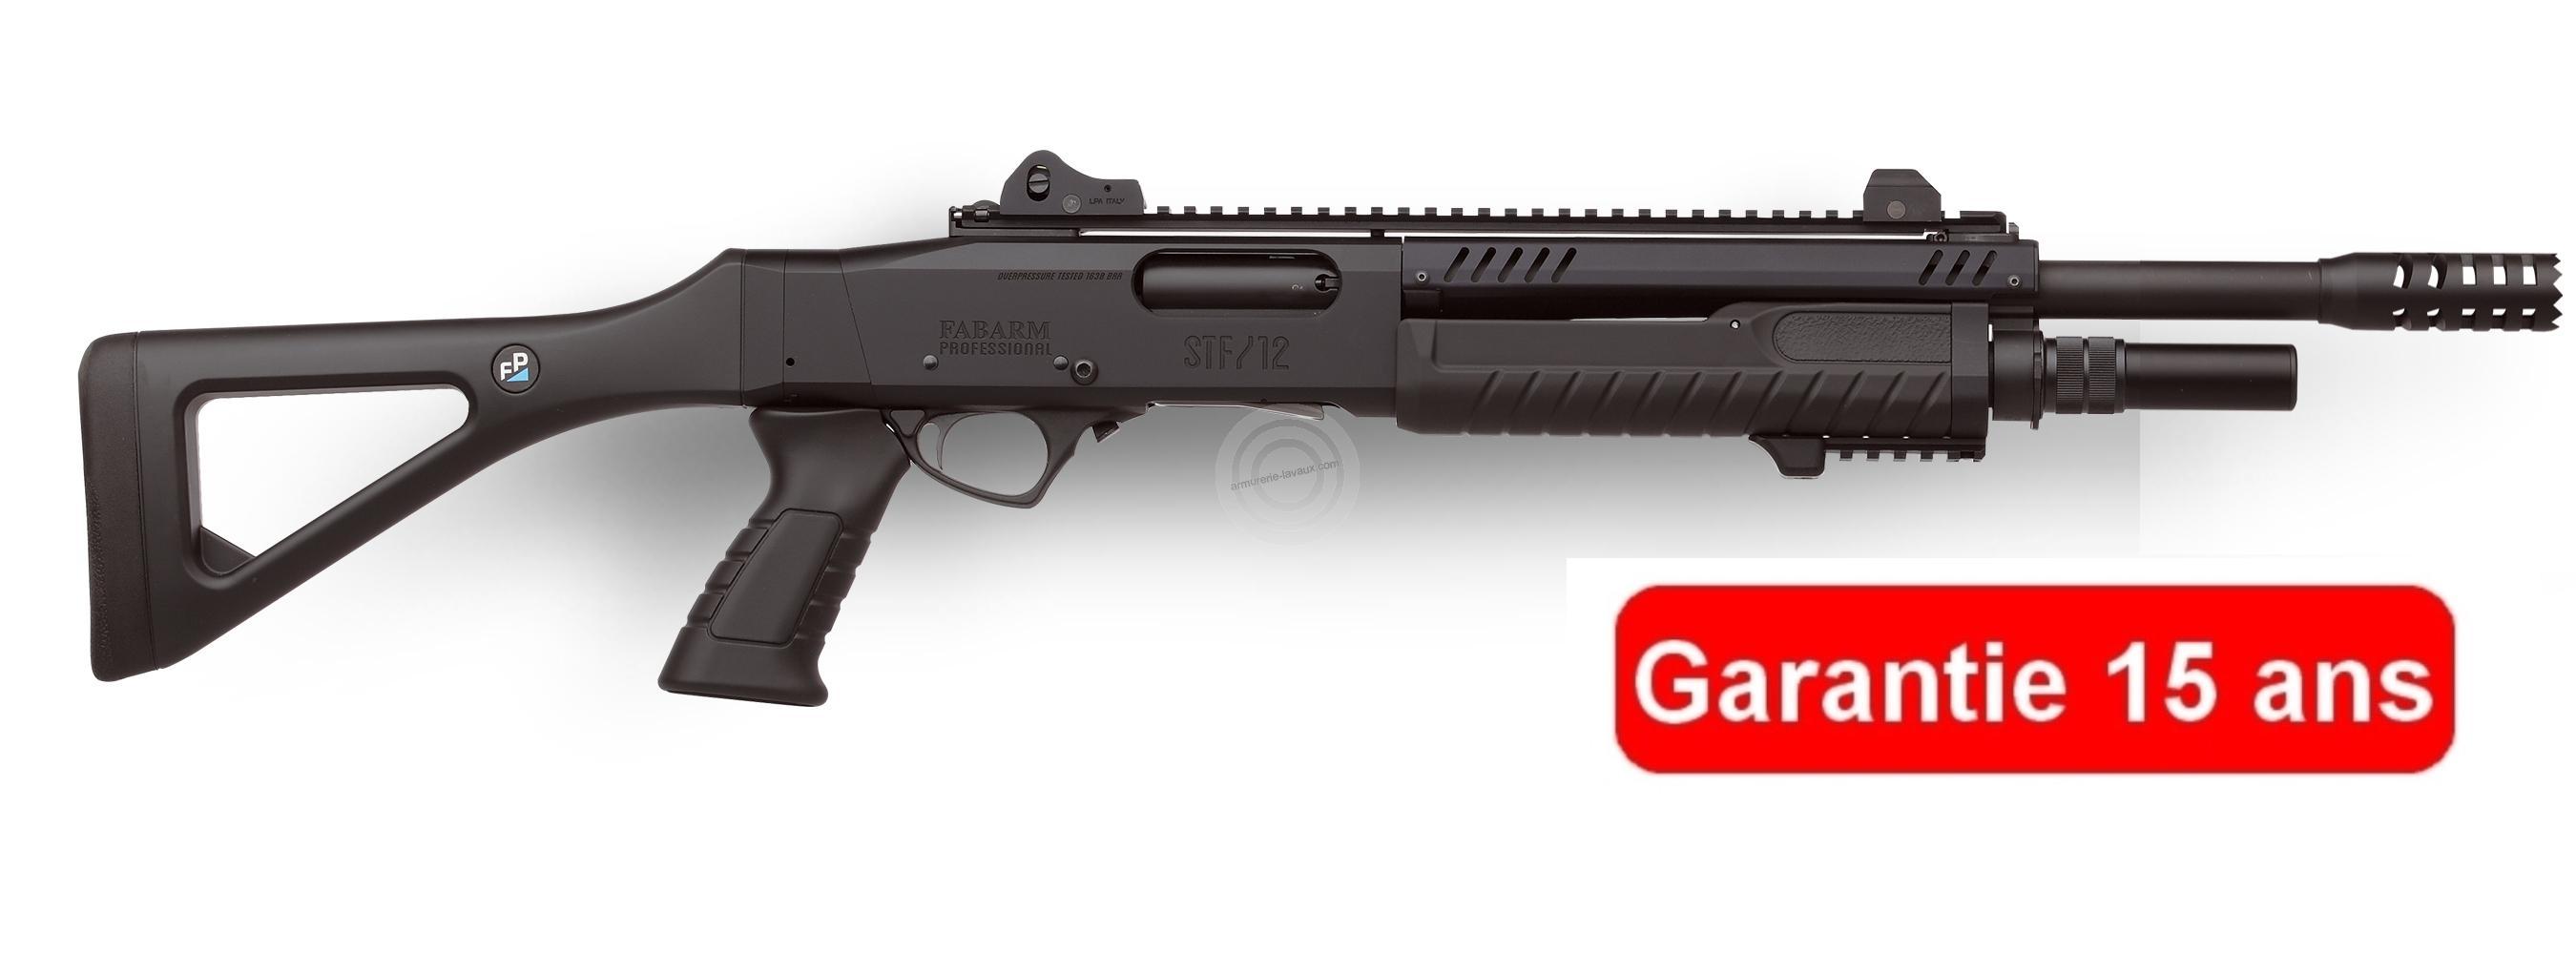 Fusil à pompe FABARM STF12 Pistolgrip 14